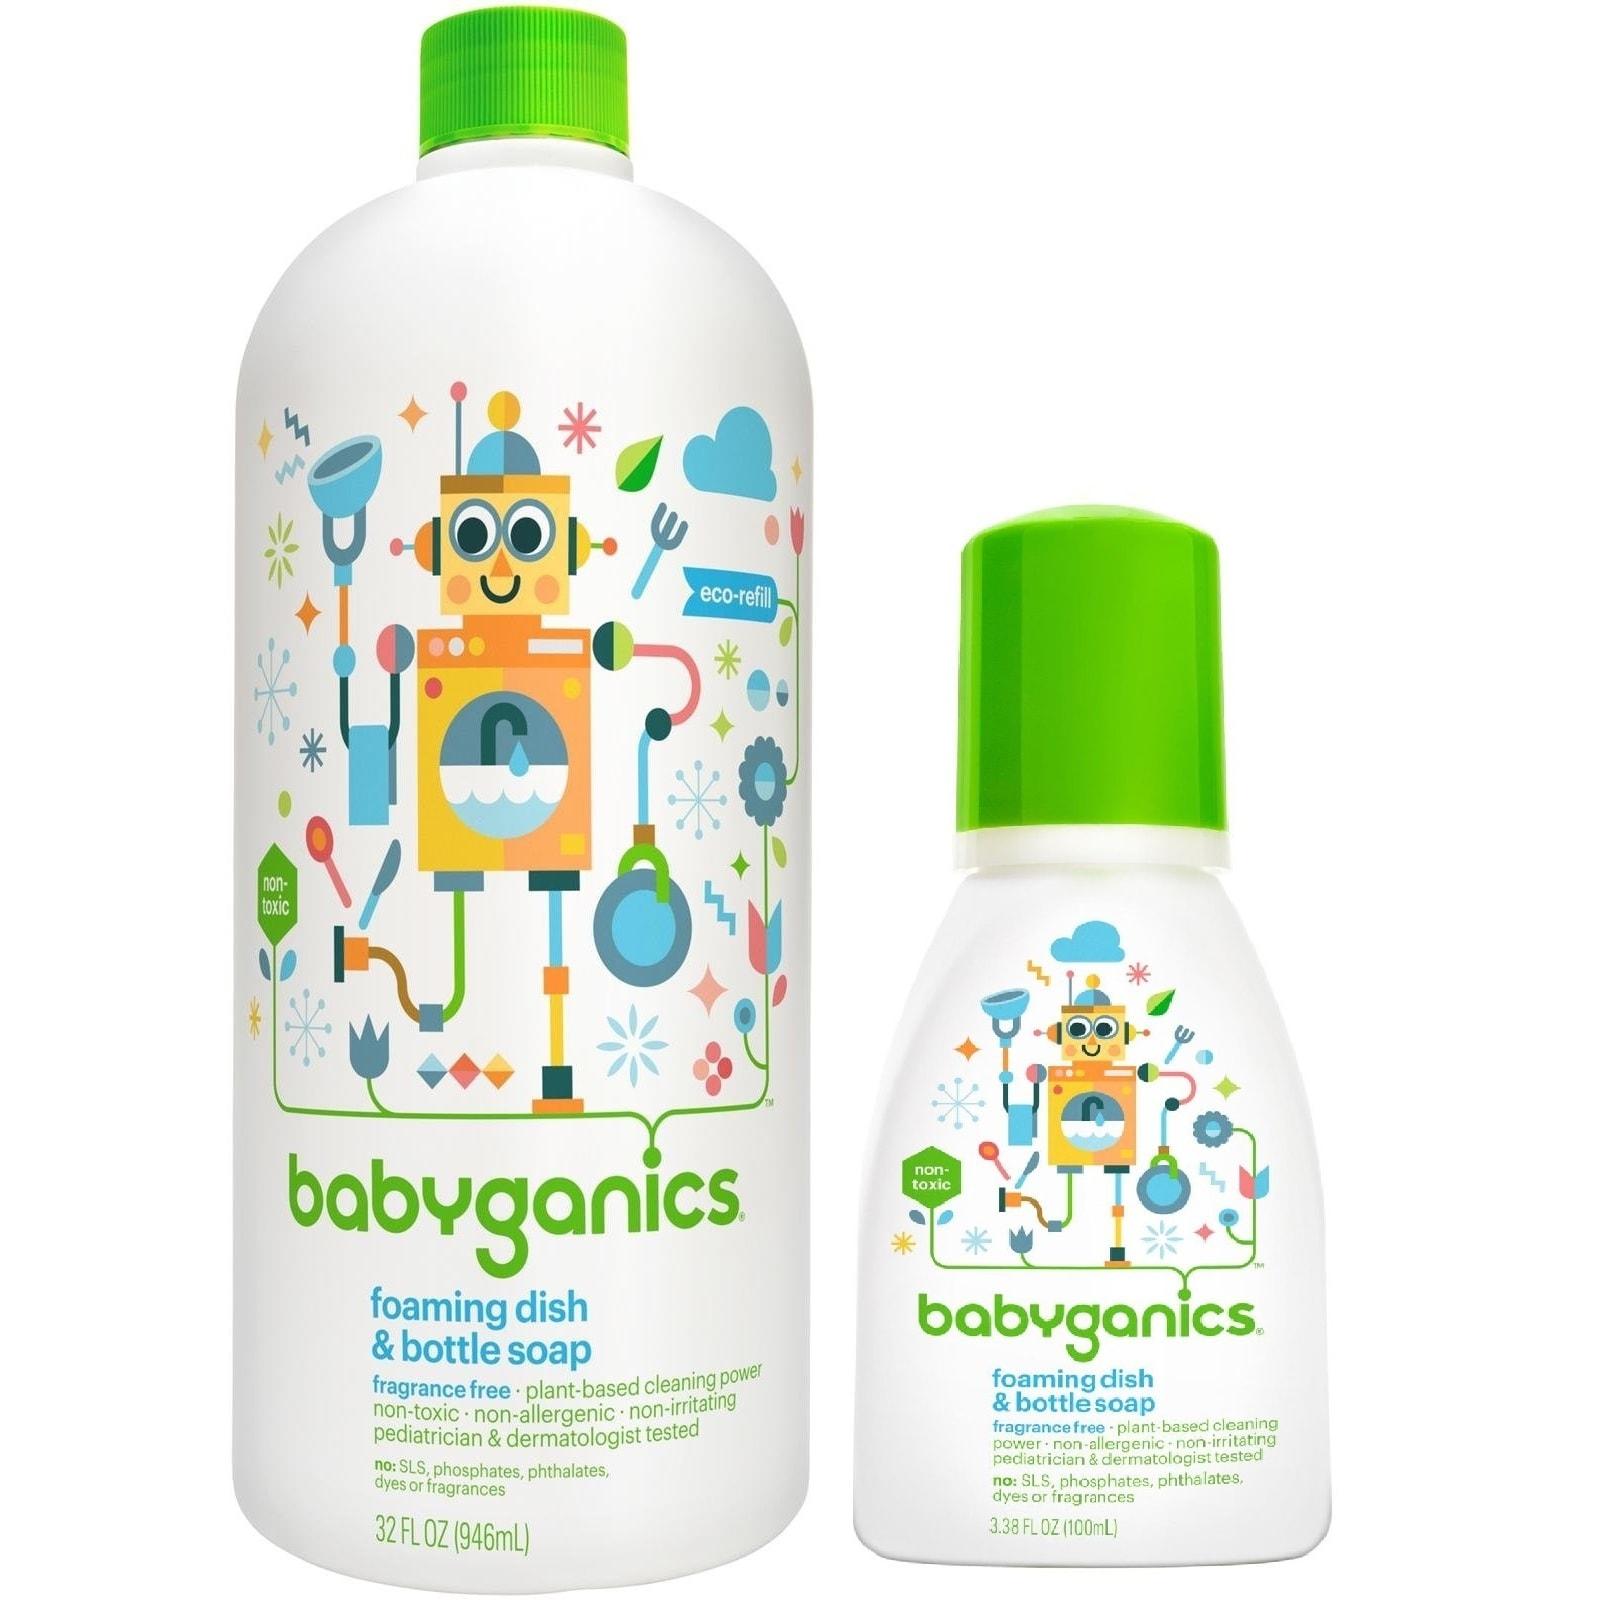 BabyGanics Fragrance Free Foaming Dish and Bottle Soap Pu...